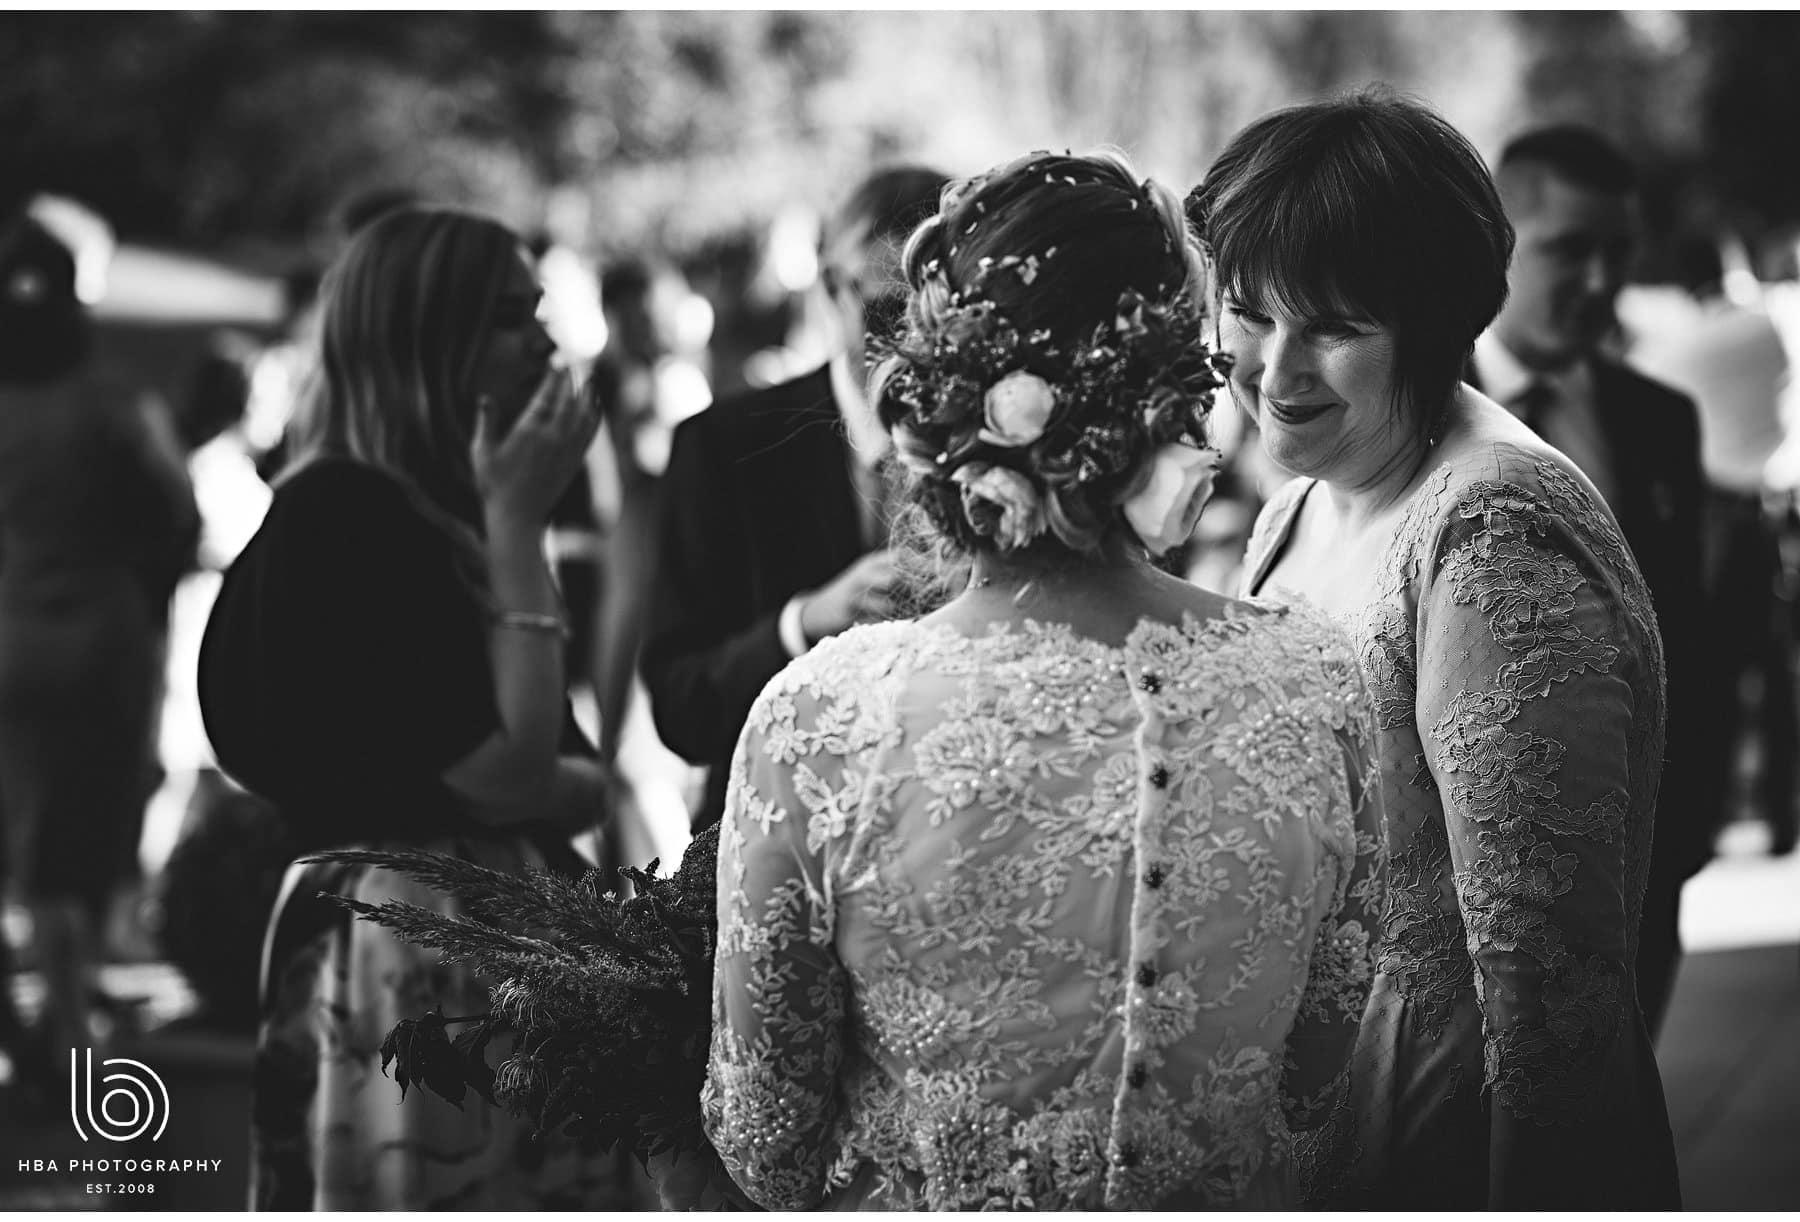 the bride talking